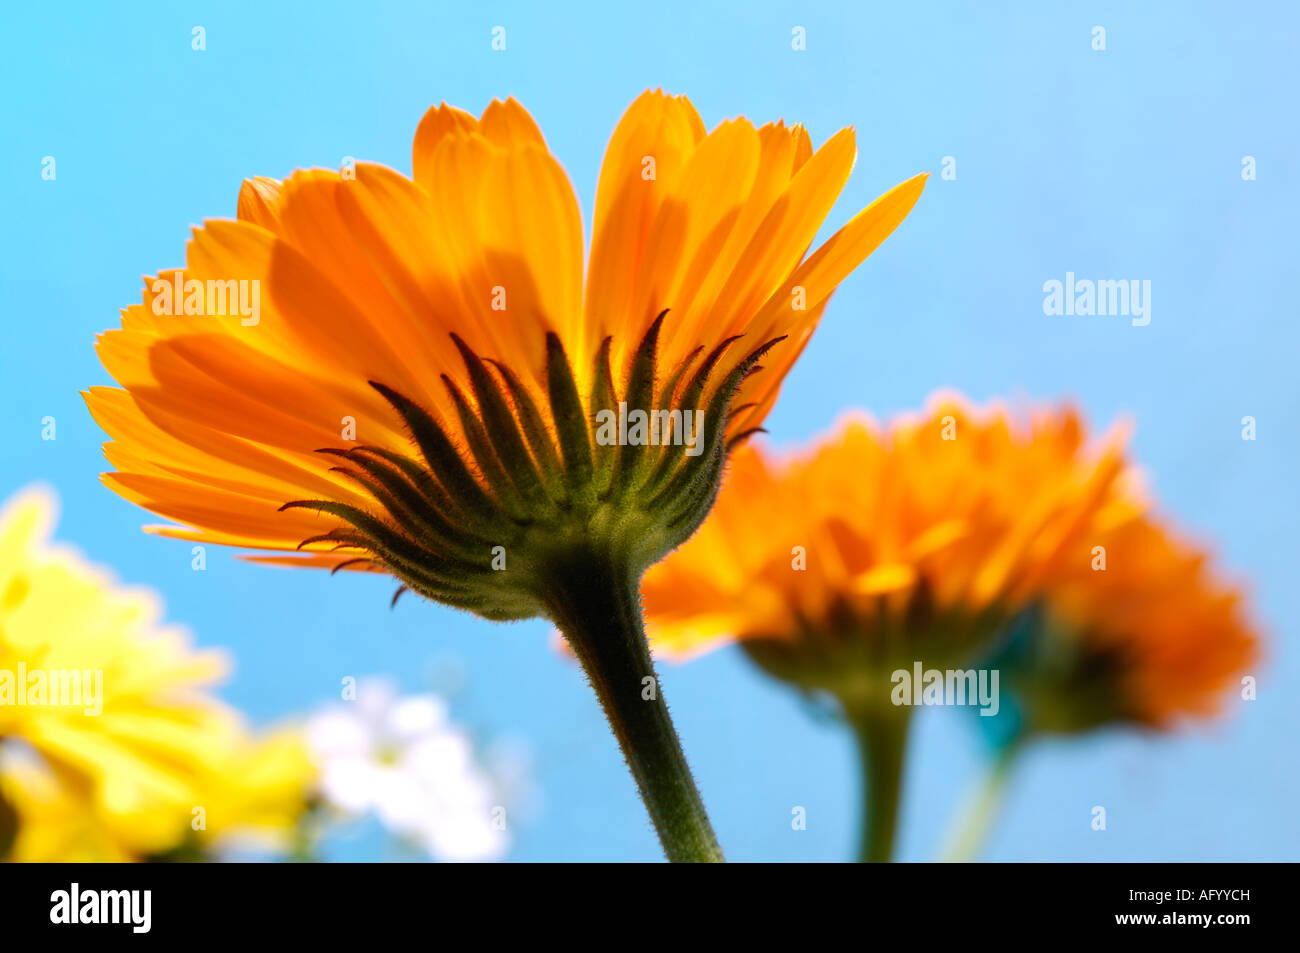 Orange Daisy Type Wild Flowers Stock Photo 14049088 Alamy